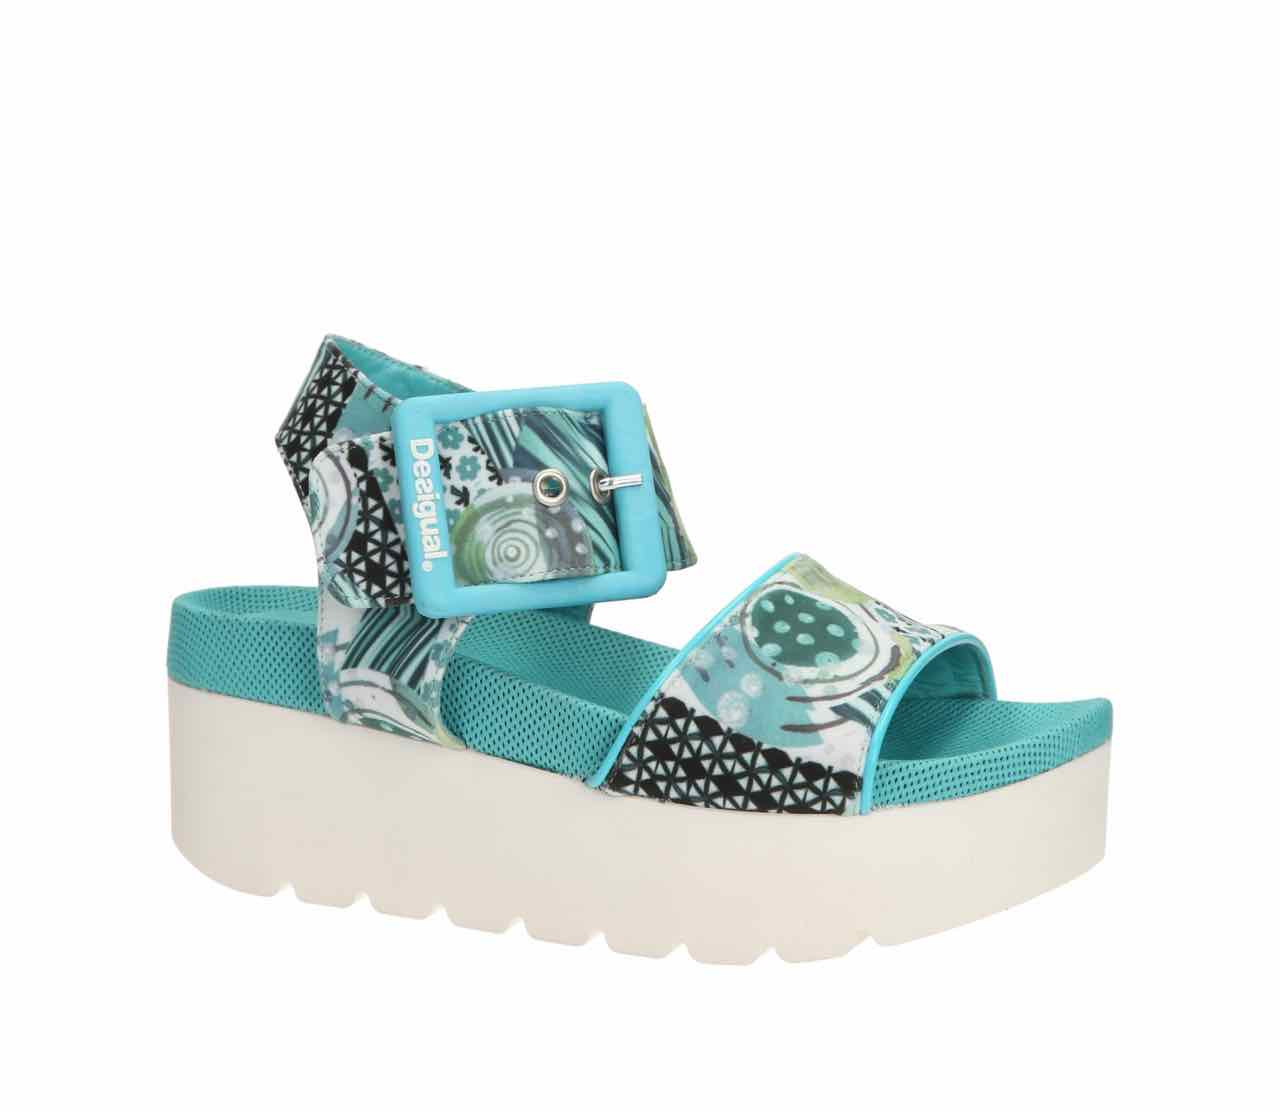 61SS2M4_5013 Desigual Sandals Maui 3